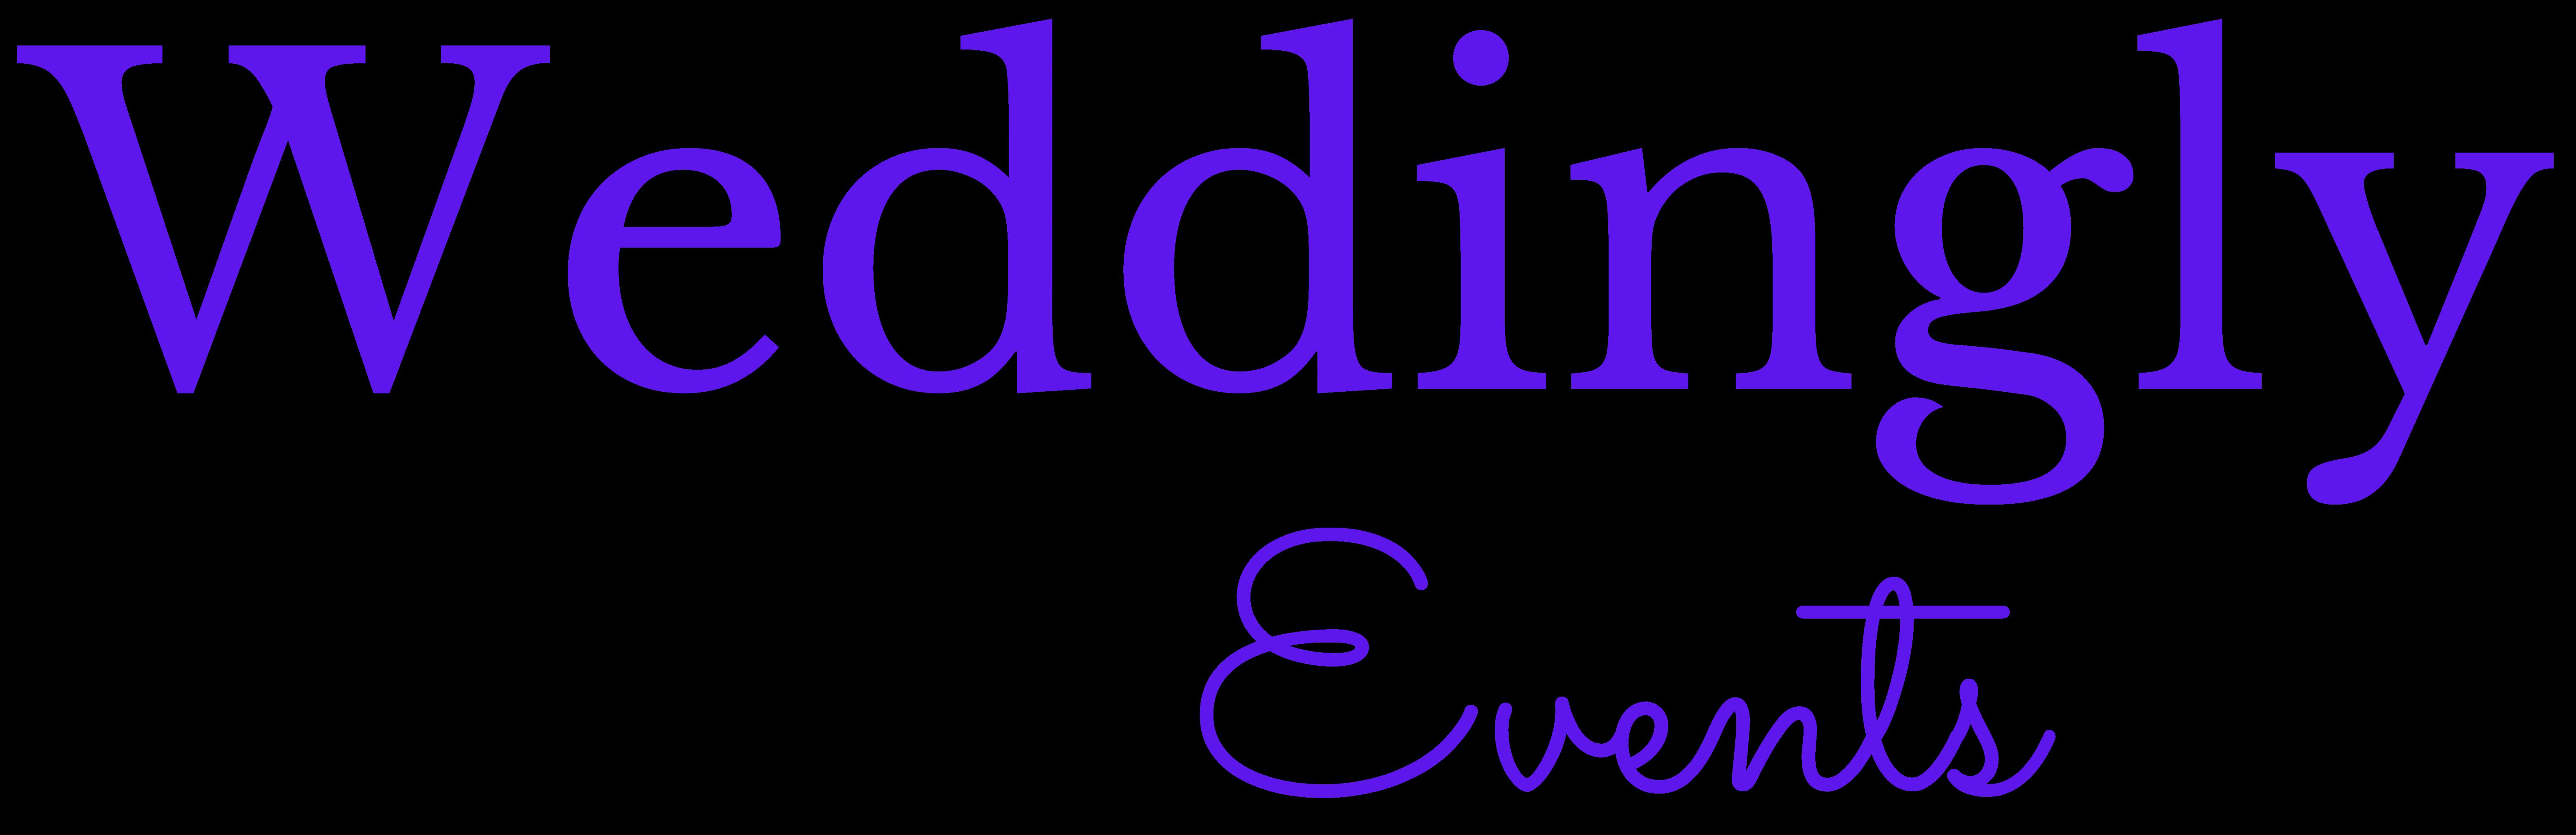 Weddingly Events Officiant Coordination St. Louis